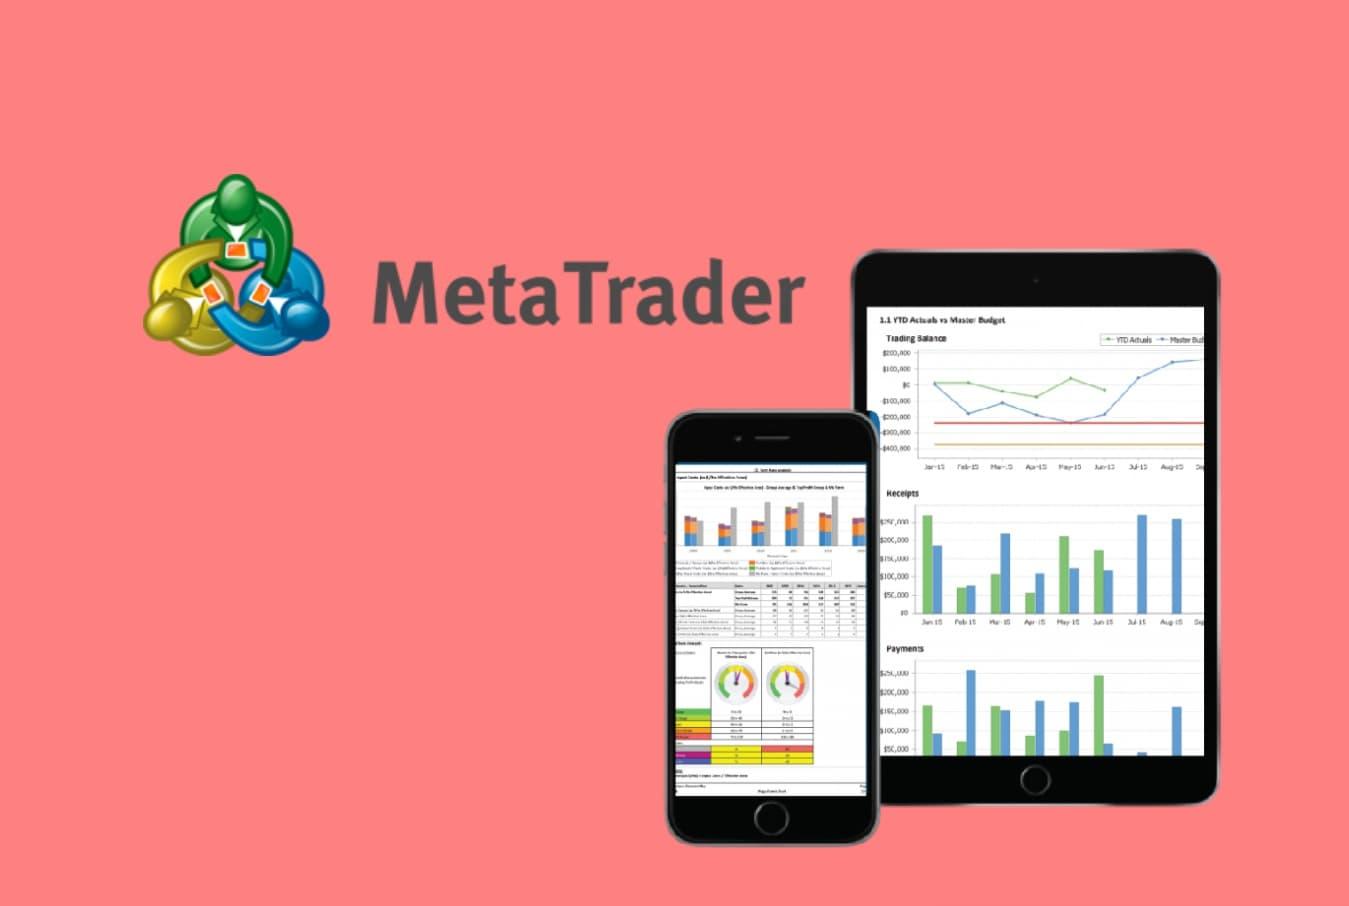 MetaTrader 4 vs MetaTrader 5 iPhone app